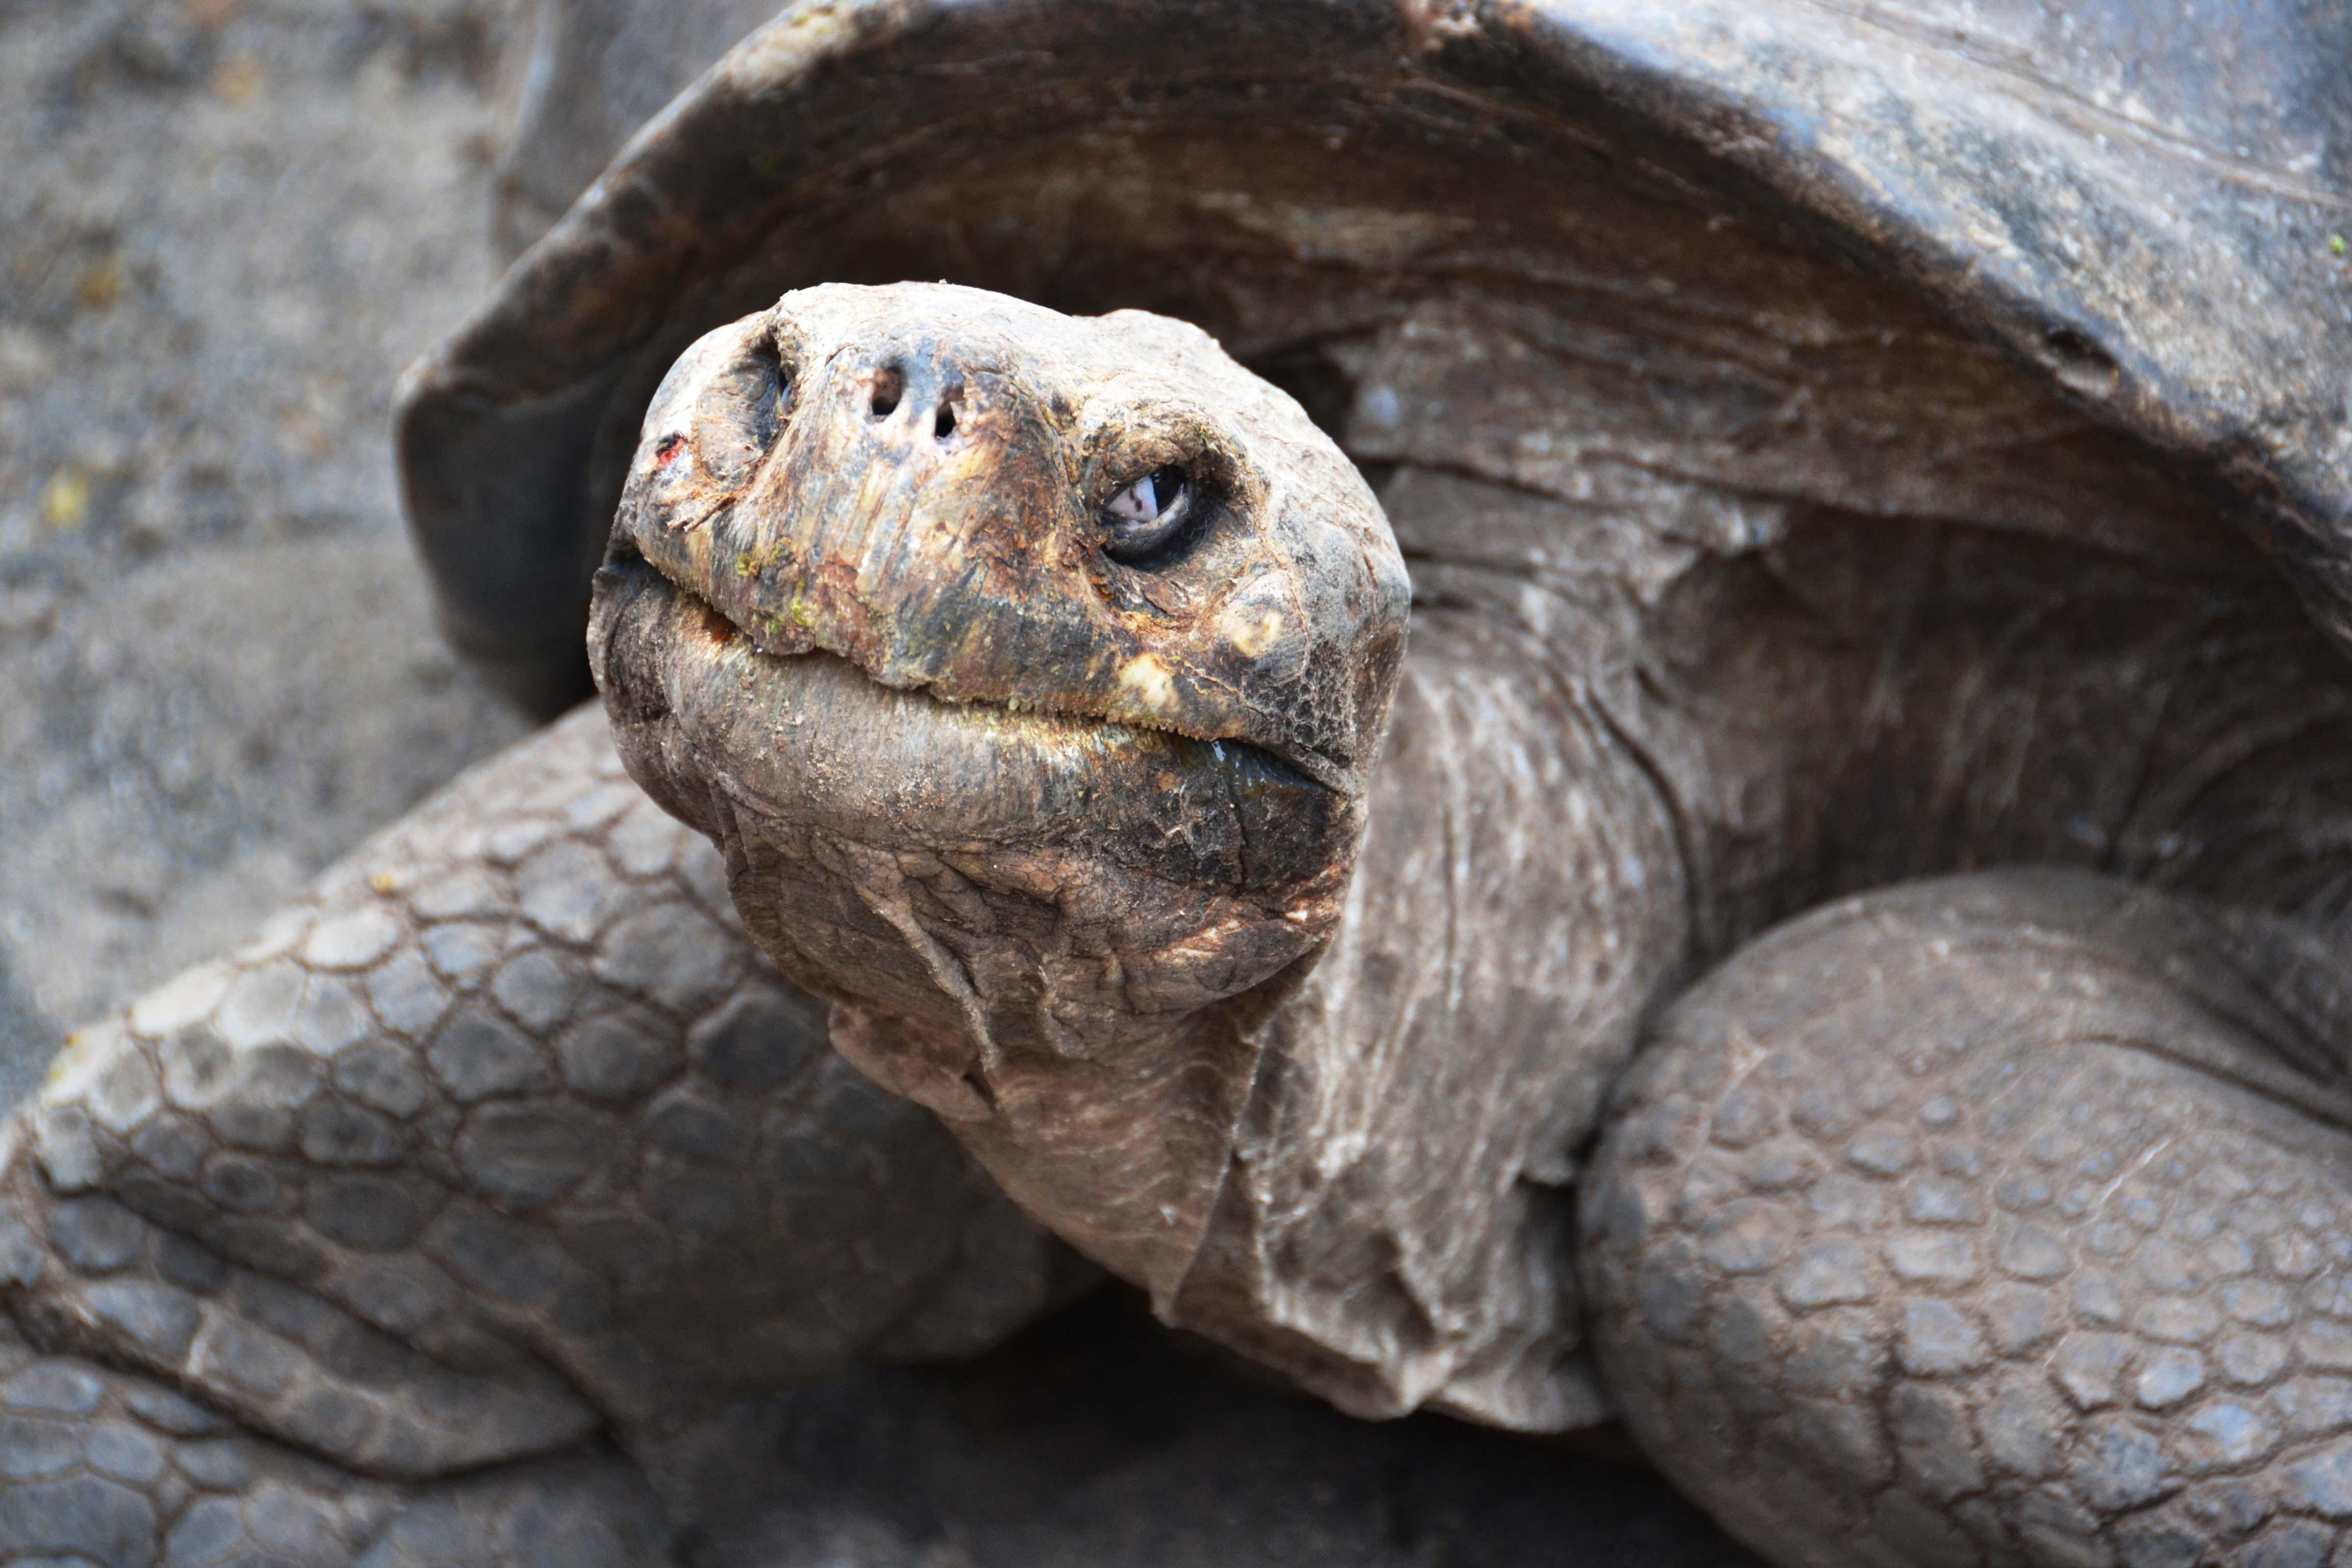 Male Tortoise Close-up